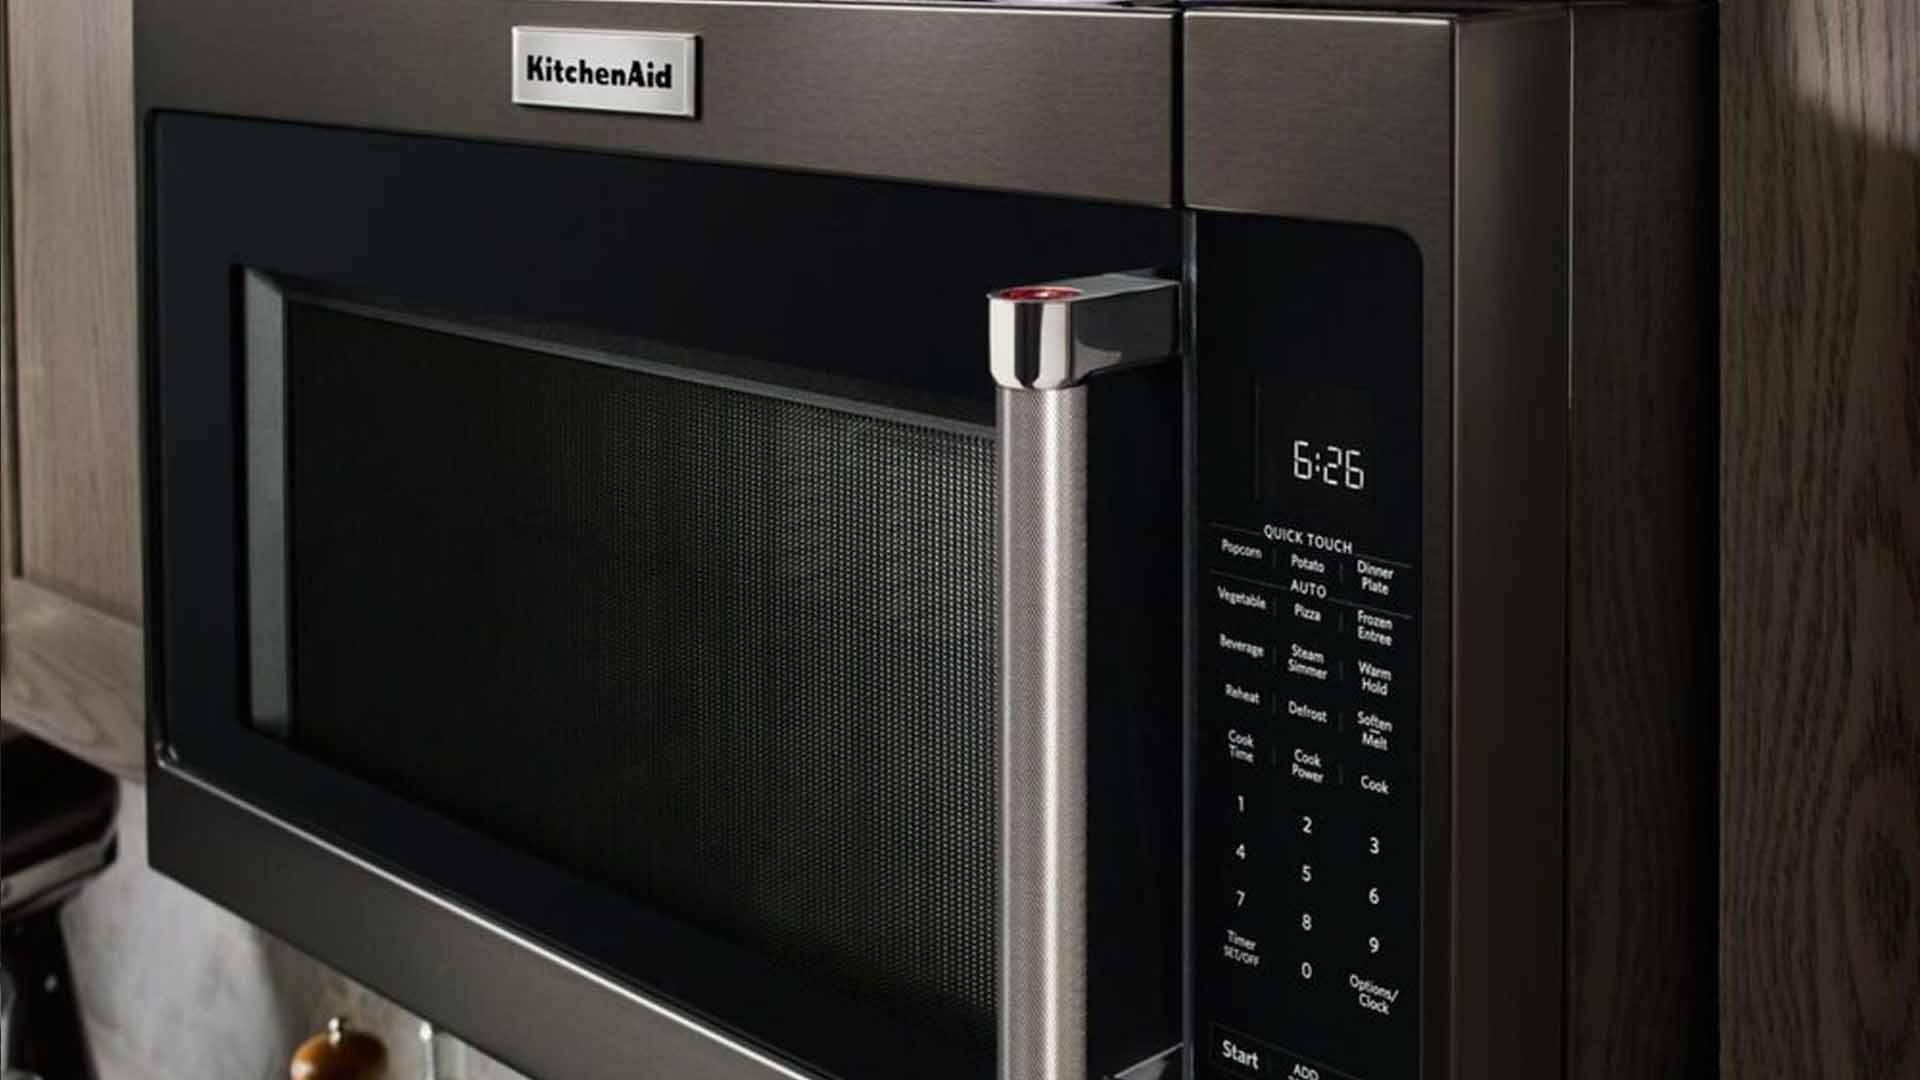 KitchenAid Microwave Repair | KitchenAid Repairs